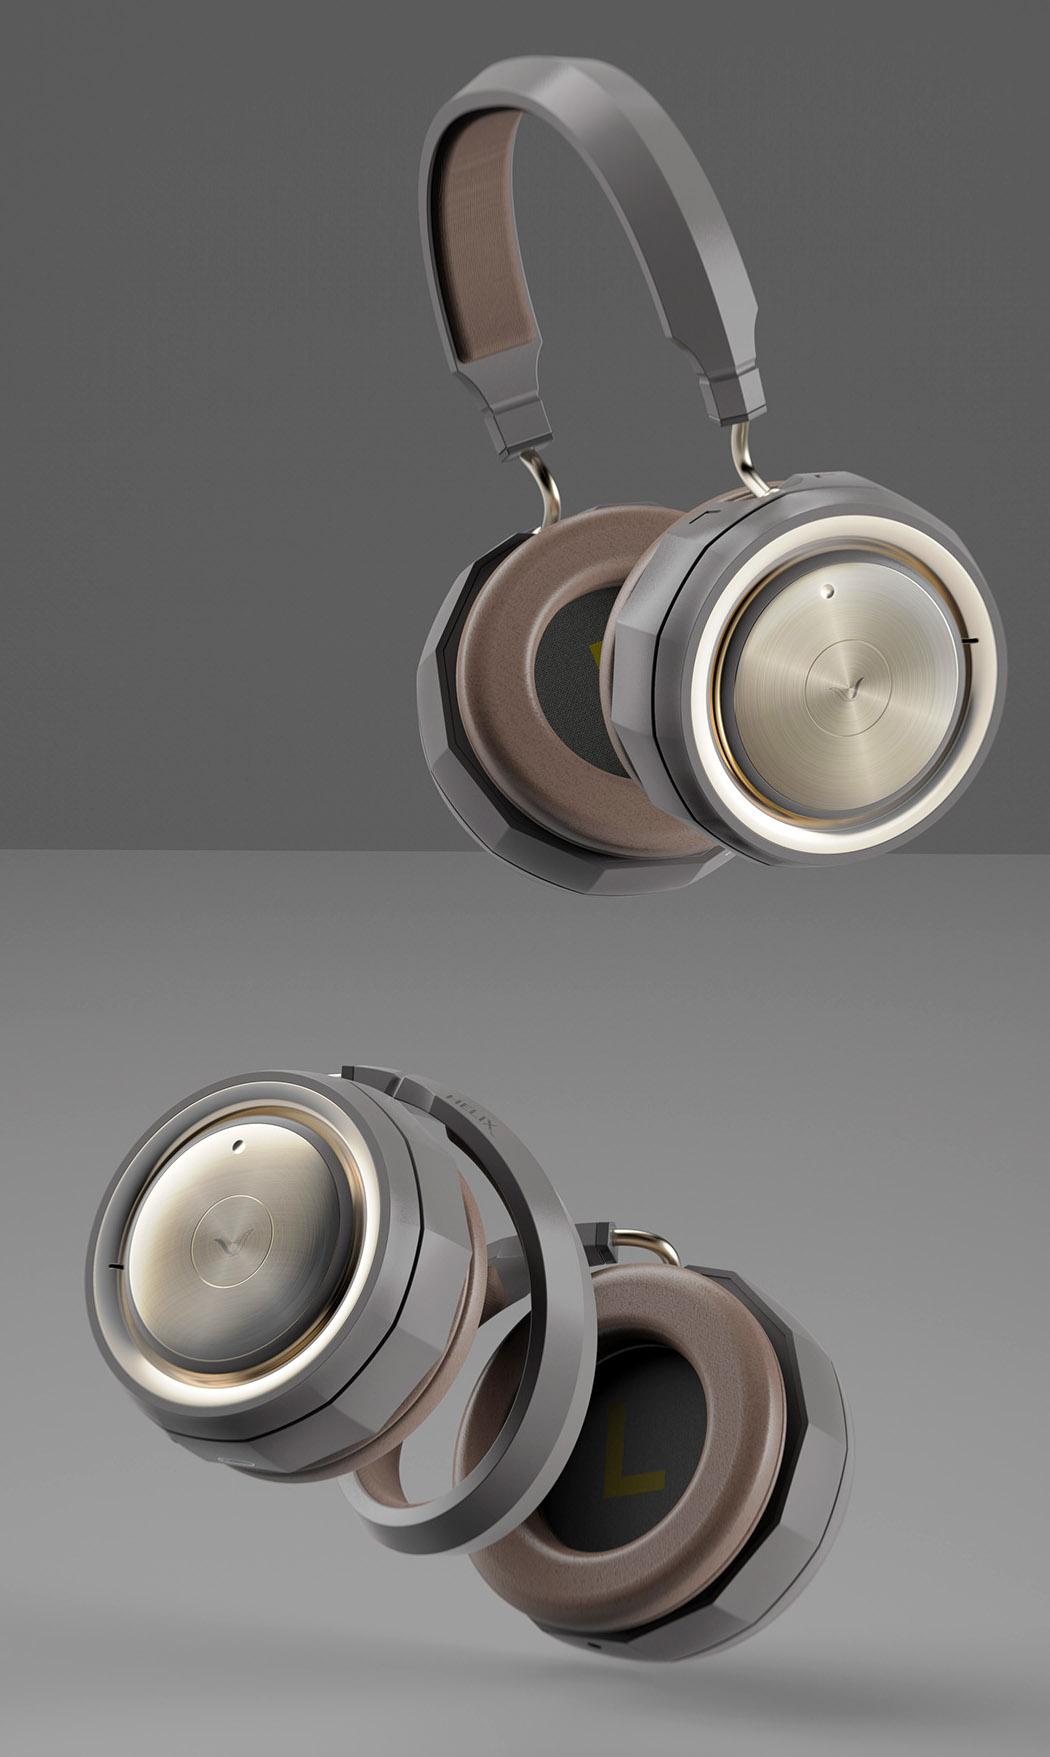 These sleek multifunctional headphones transform into a spiral-shaped speaker!